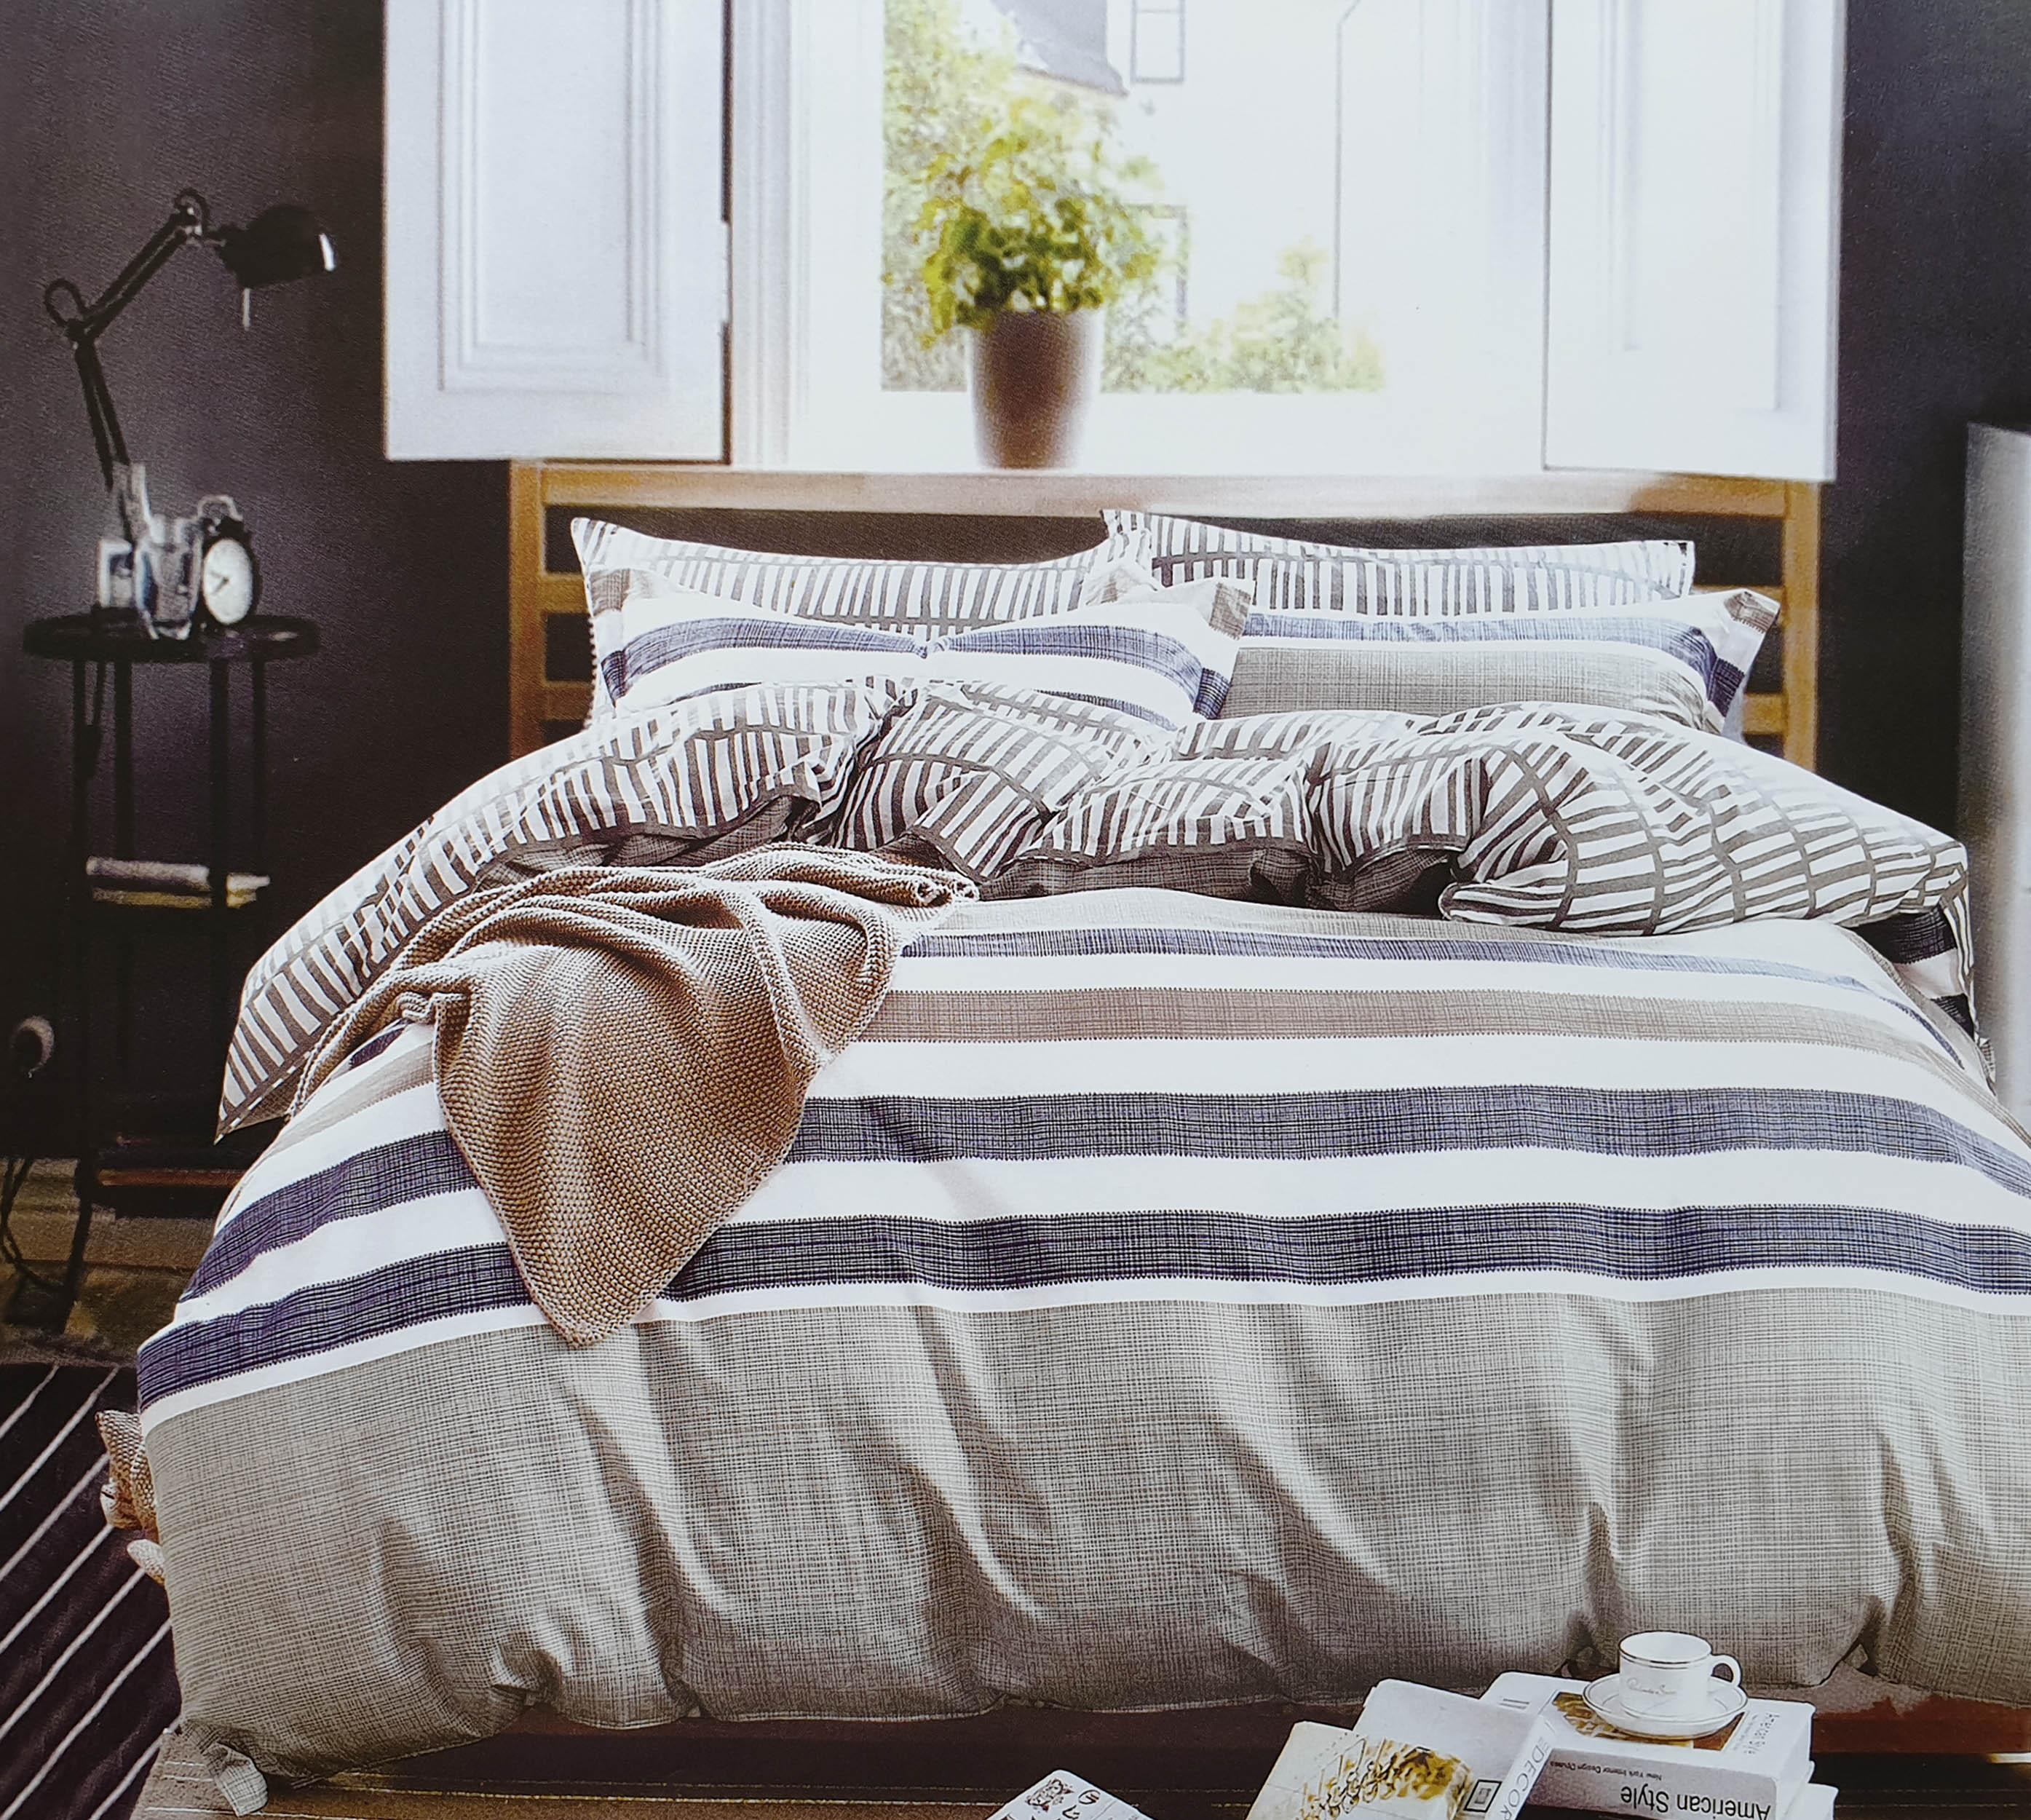 Beddings by cushion mania